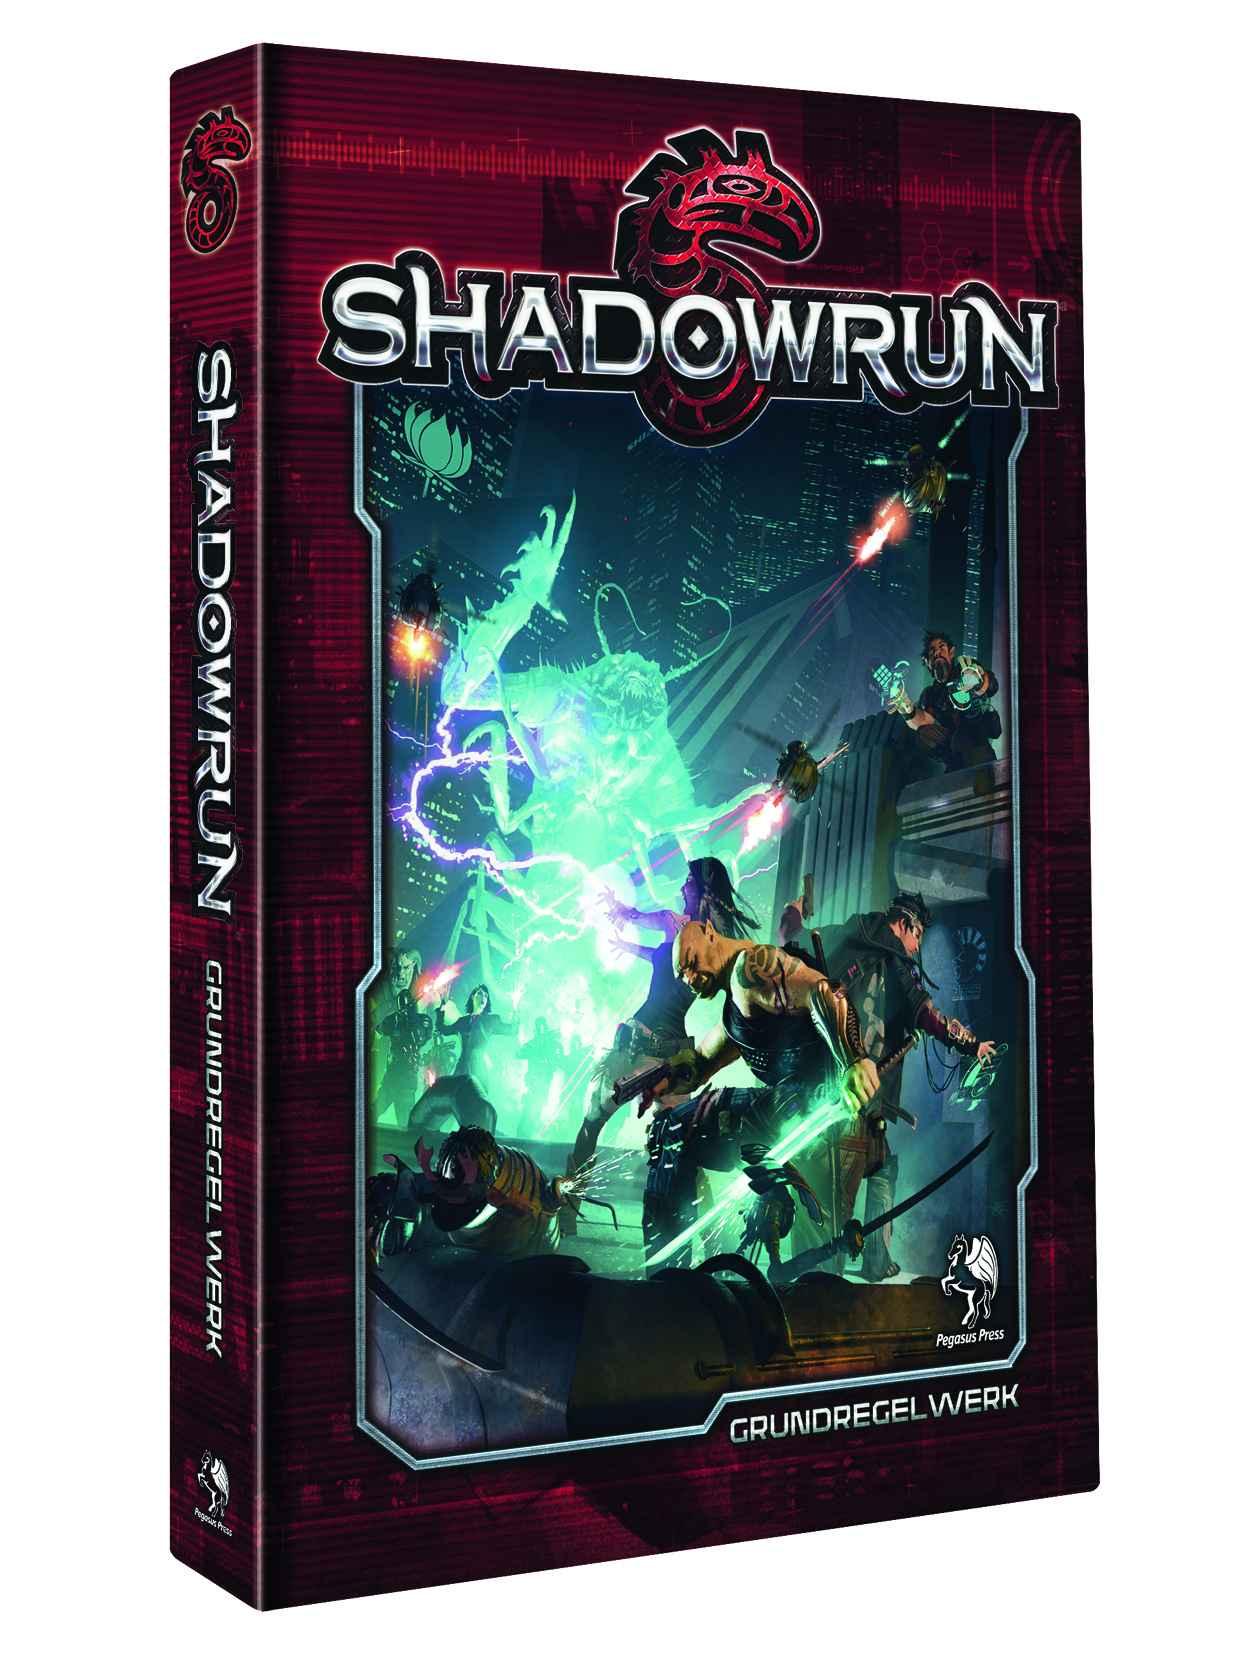 Shadowrun 5 - Grundregelwerk (Pegasus Spiele)